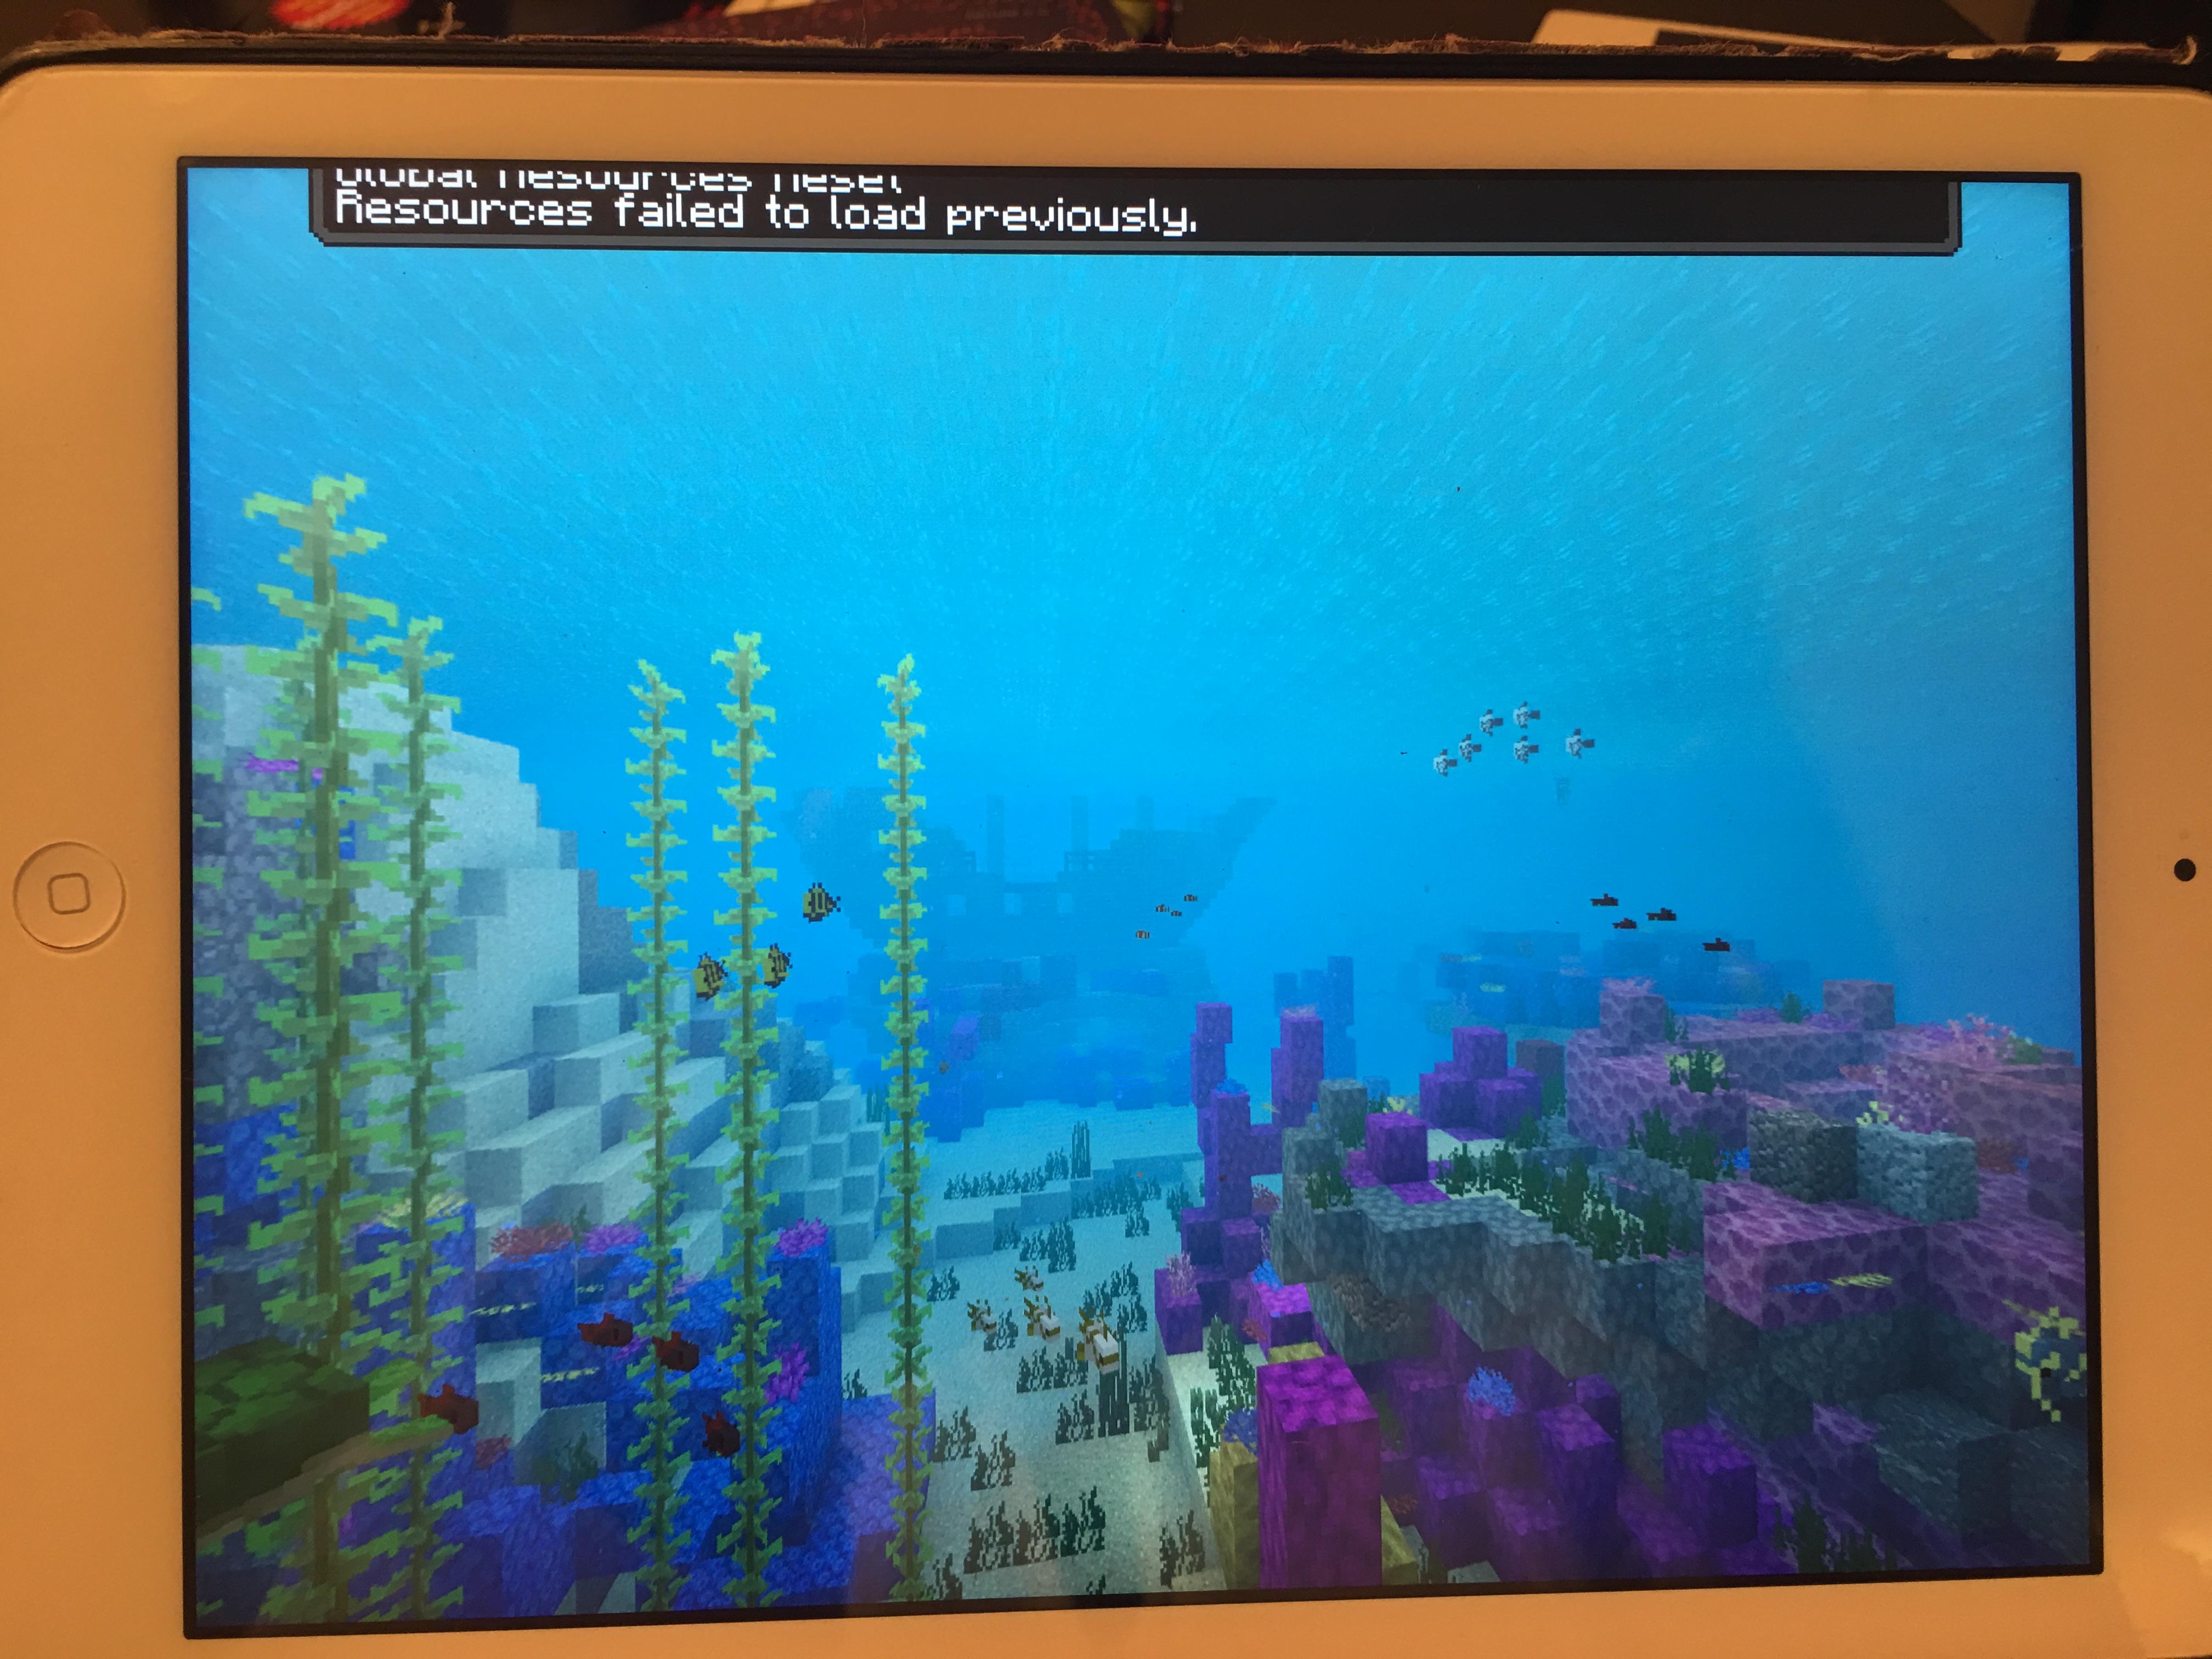 minecraft wont launch on ipad